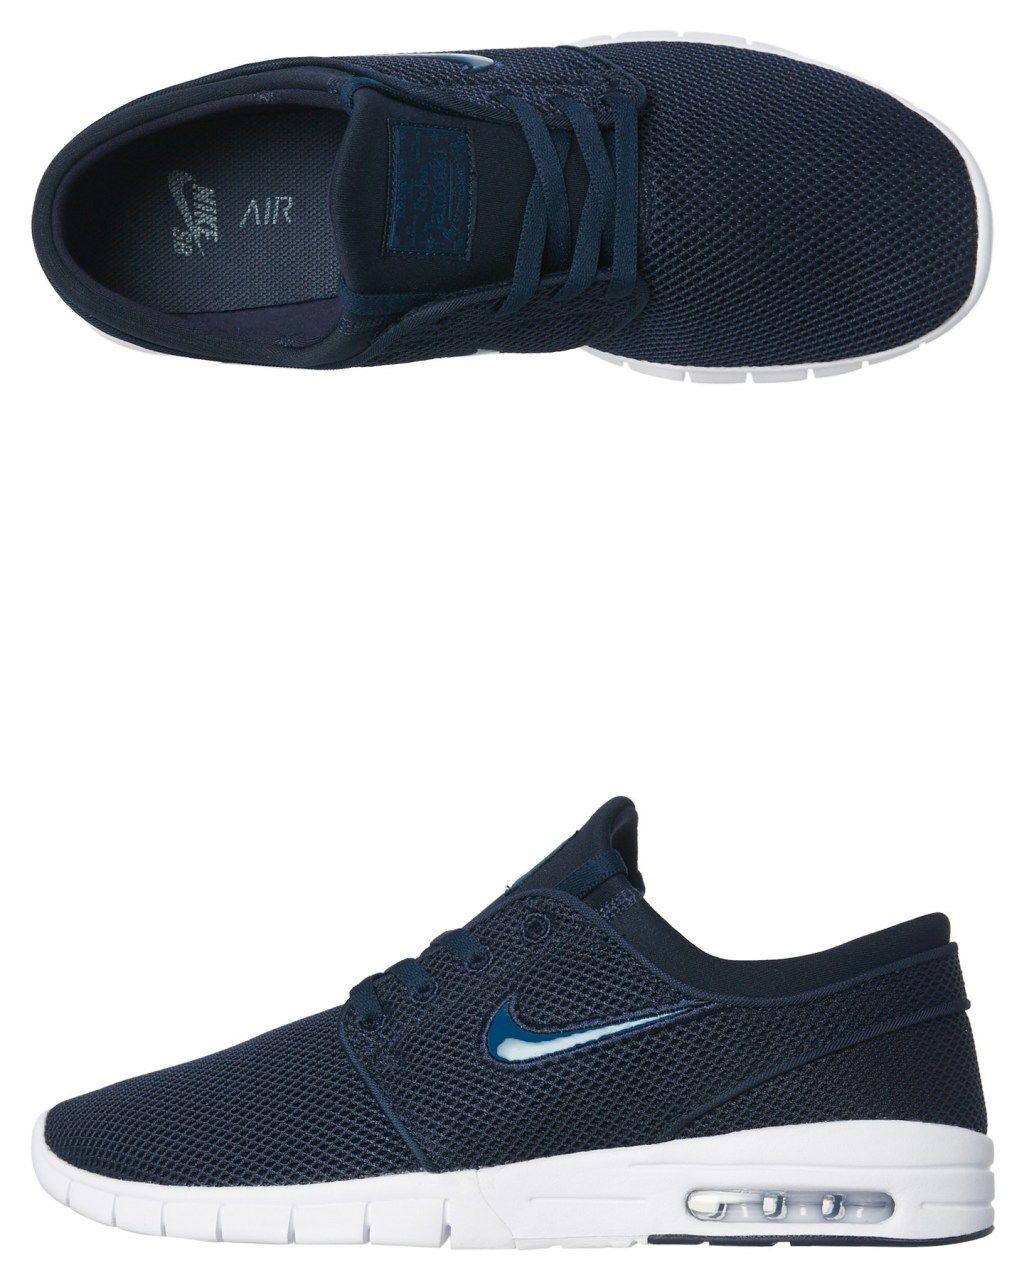 the best attitude 4c00e e04f4 Nike Mens Sb Stefan Janoski Max Shoe Obsidian White Obsidian White Womens  Sneakers Size 11